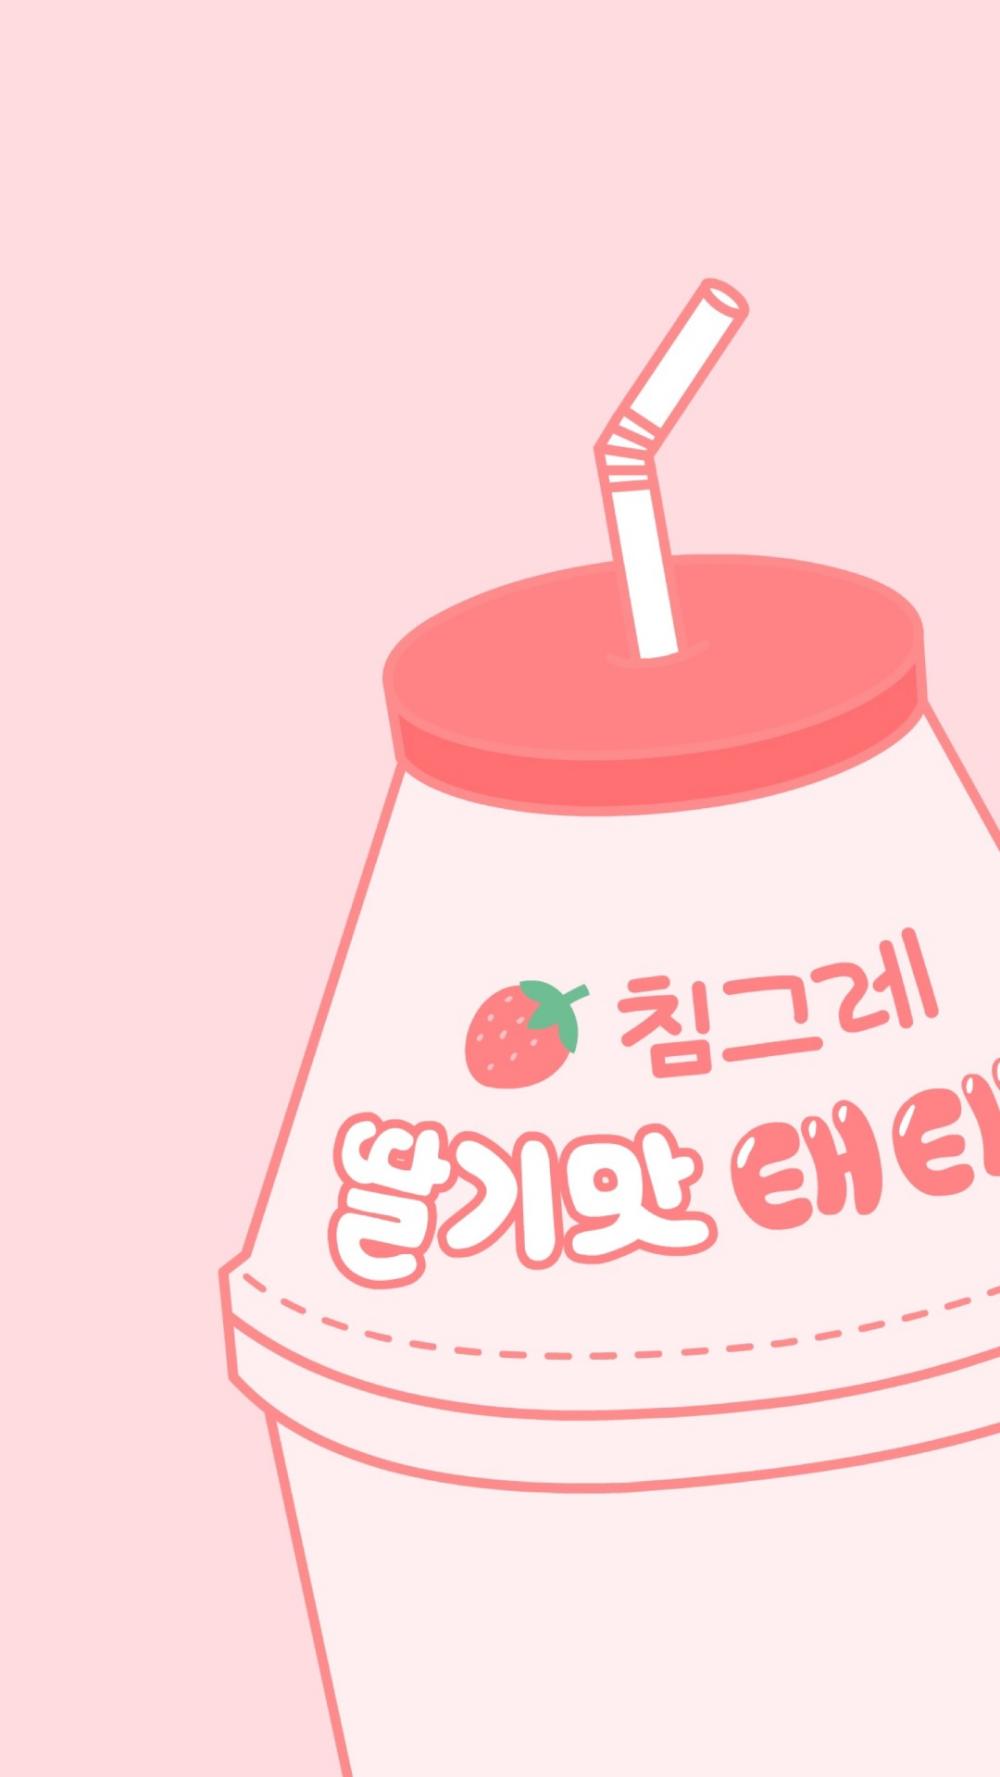 Molang Cute Korean Bunny Iphone Mobile Phone Wallpaper Kawaii Doodles Iphone Cartoon Kawaii Wallpaper